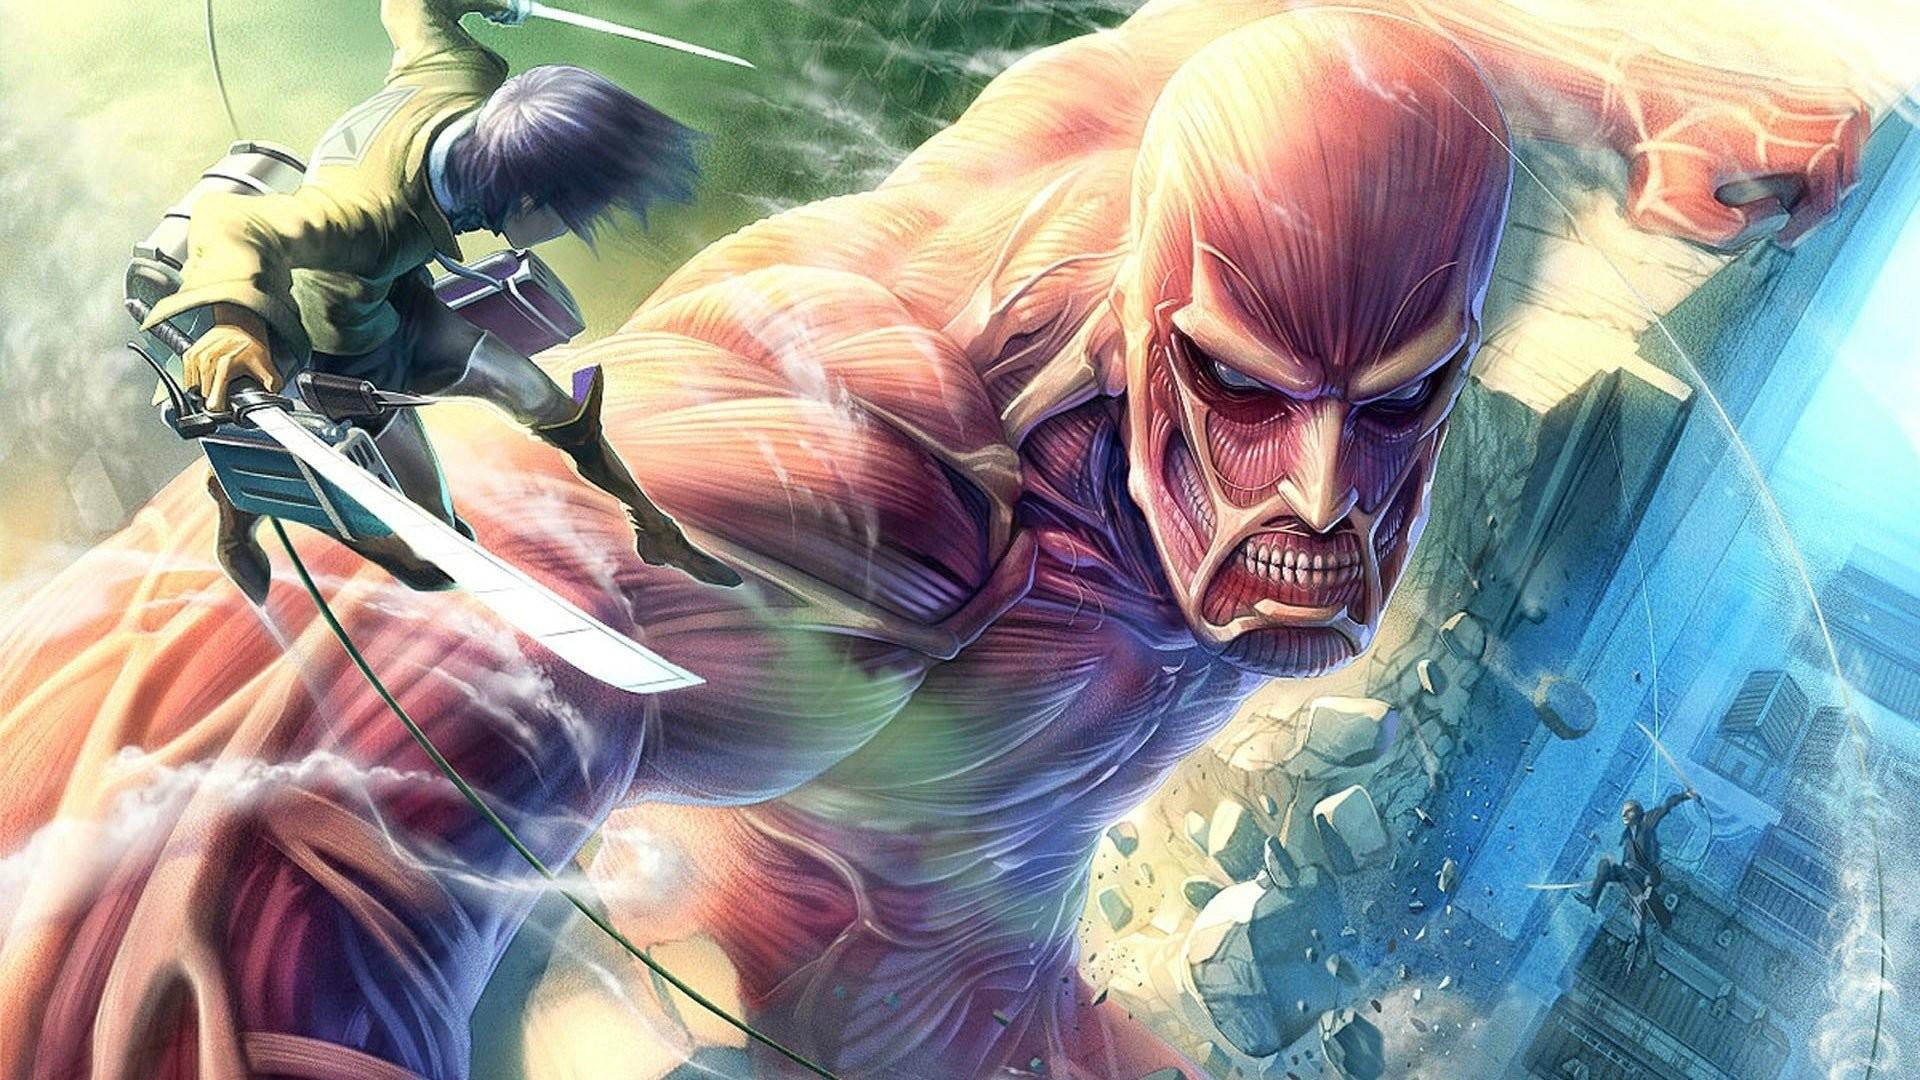 HD Wallpaper   Hintergrund ID:557030. Anime Attack On Titan